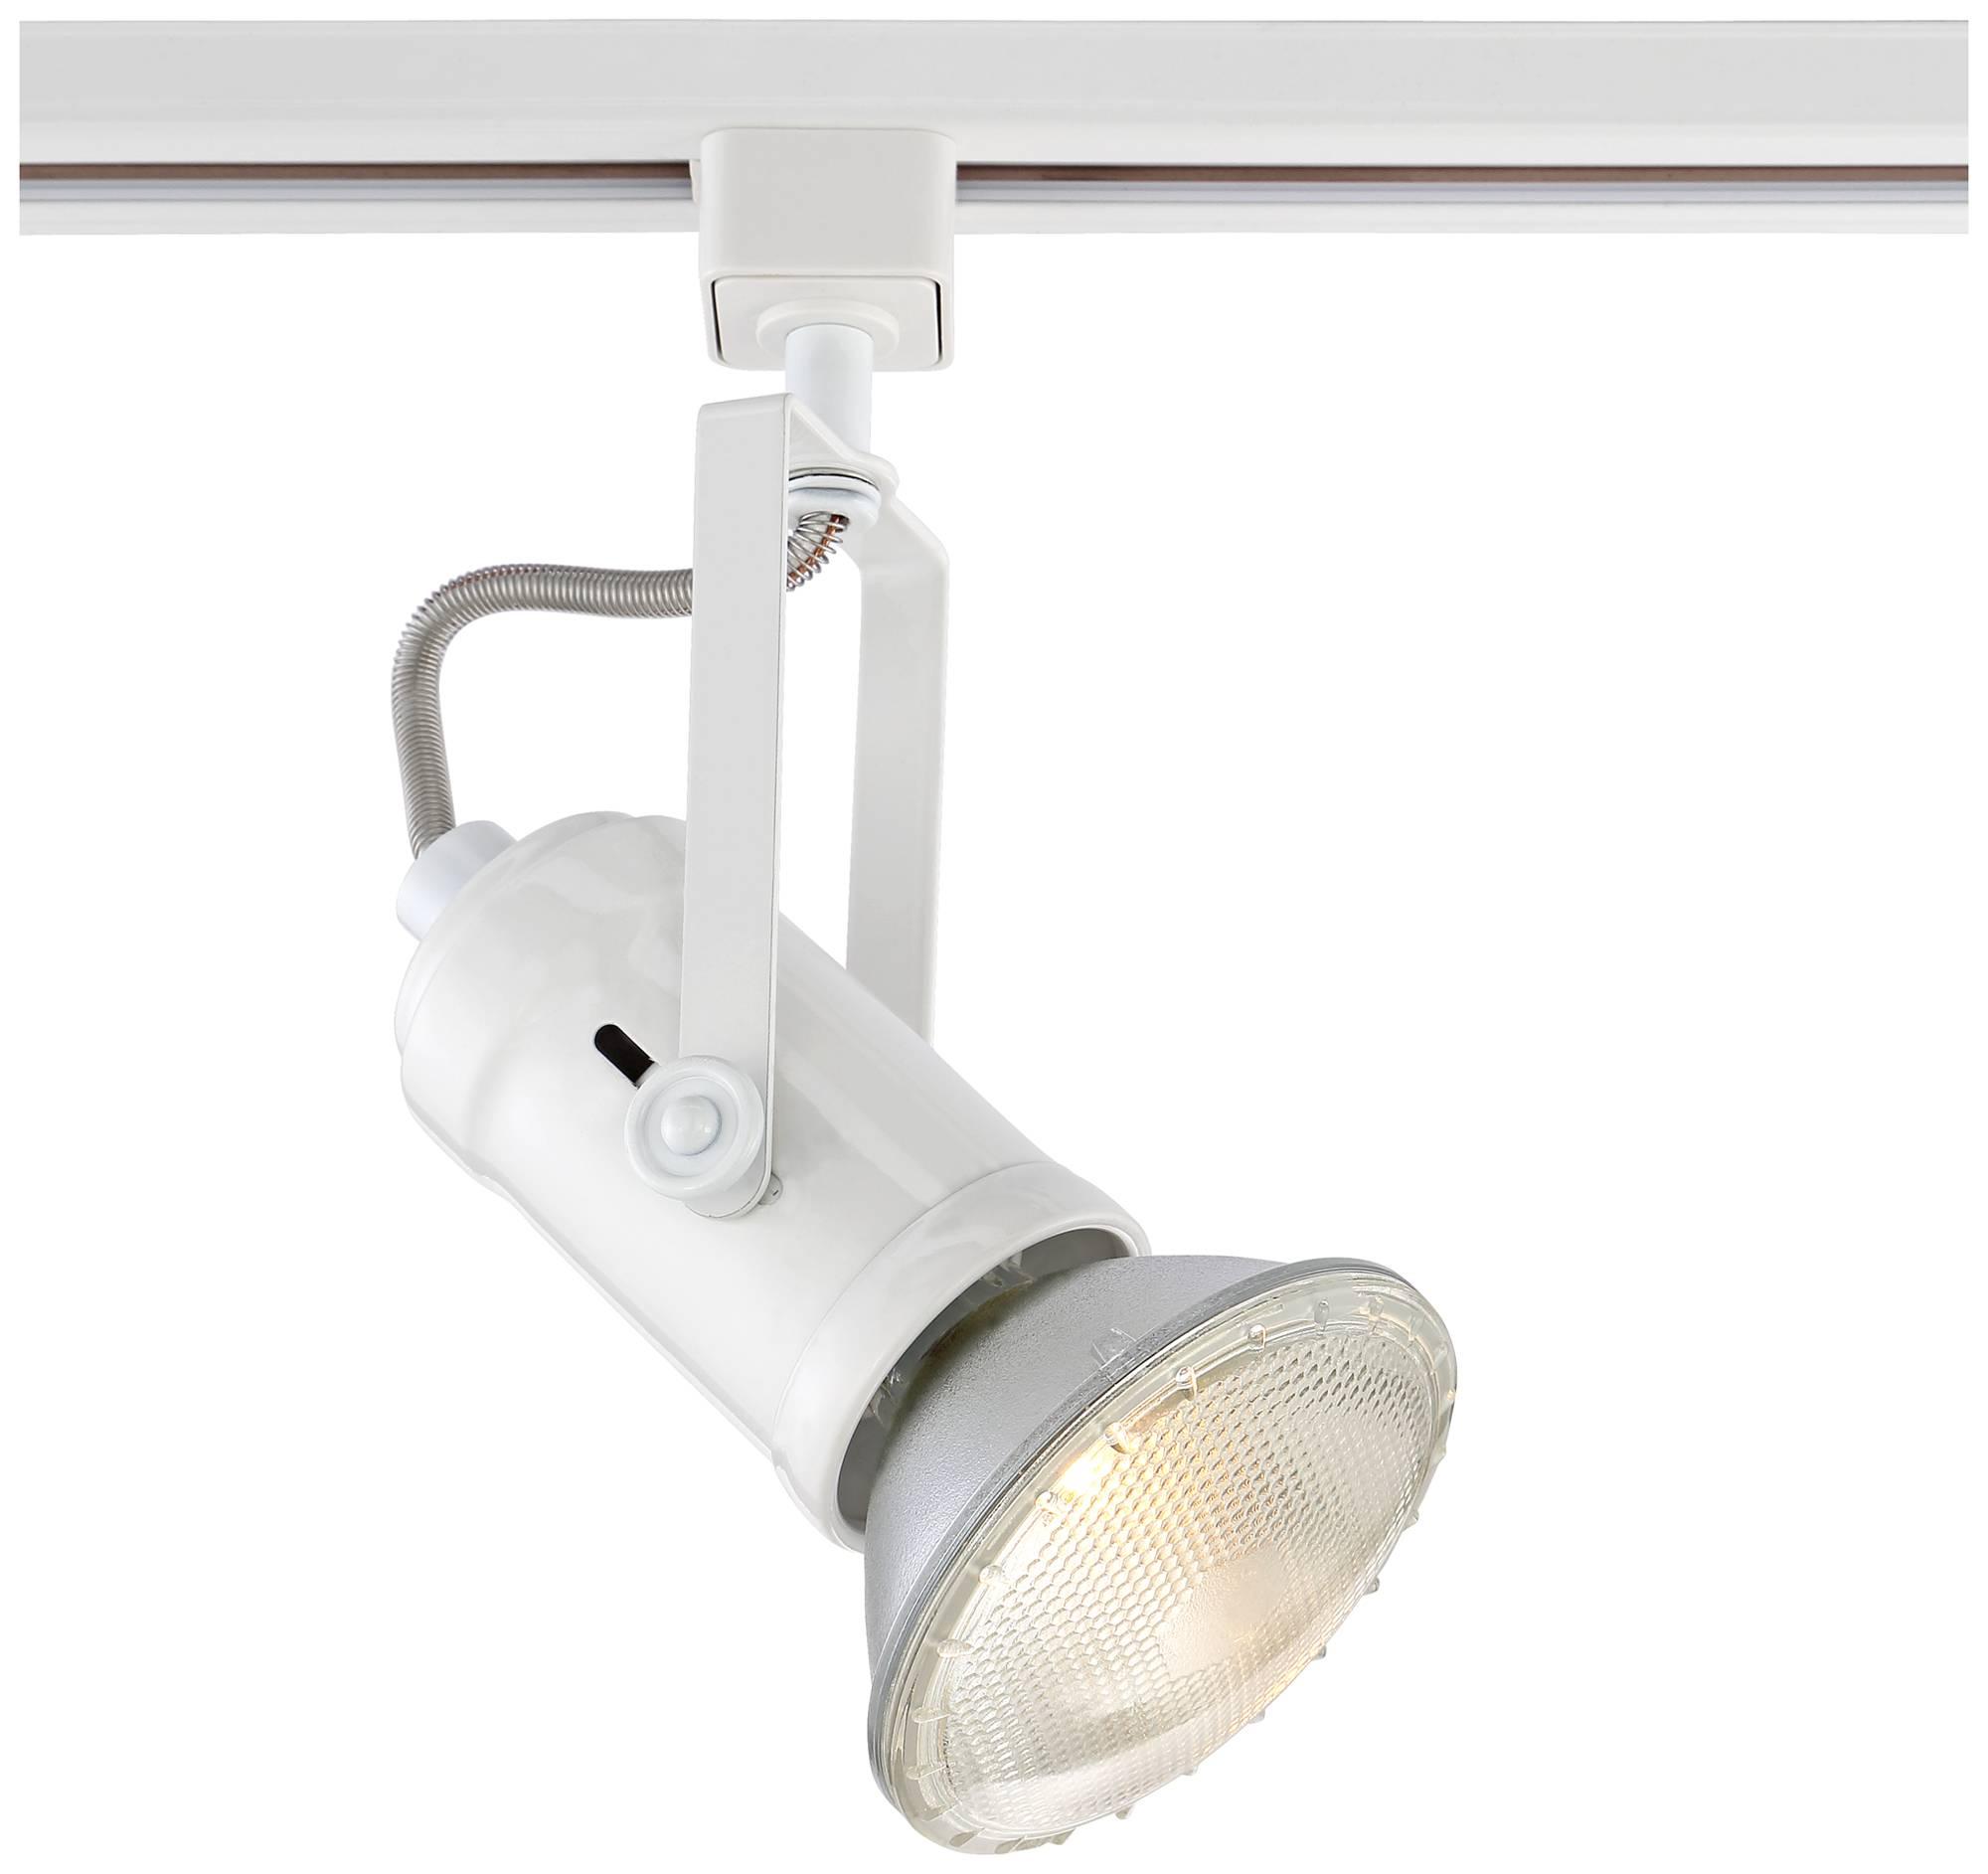 Pro track archer white universal halo track bullet light